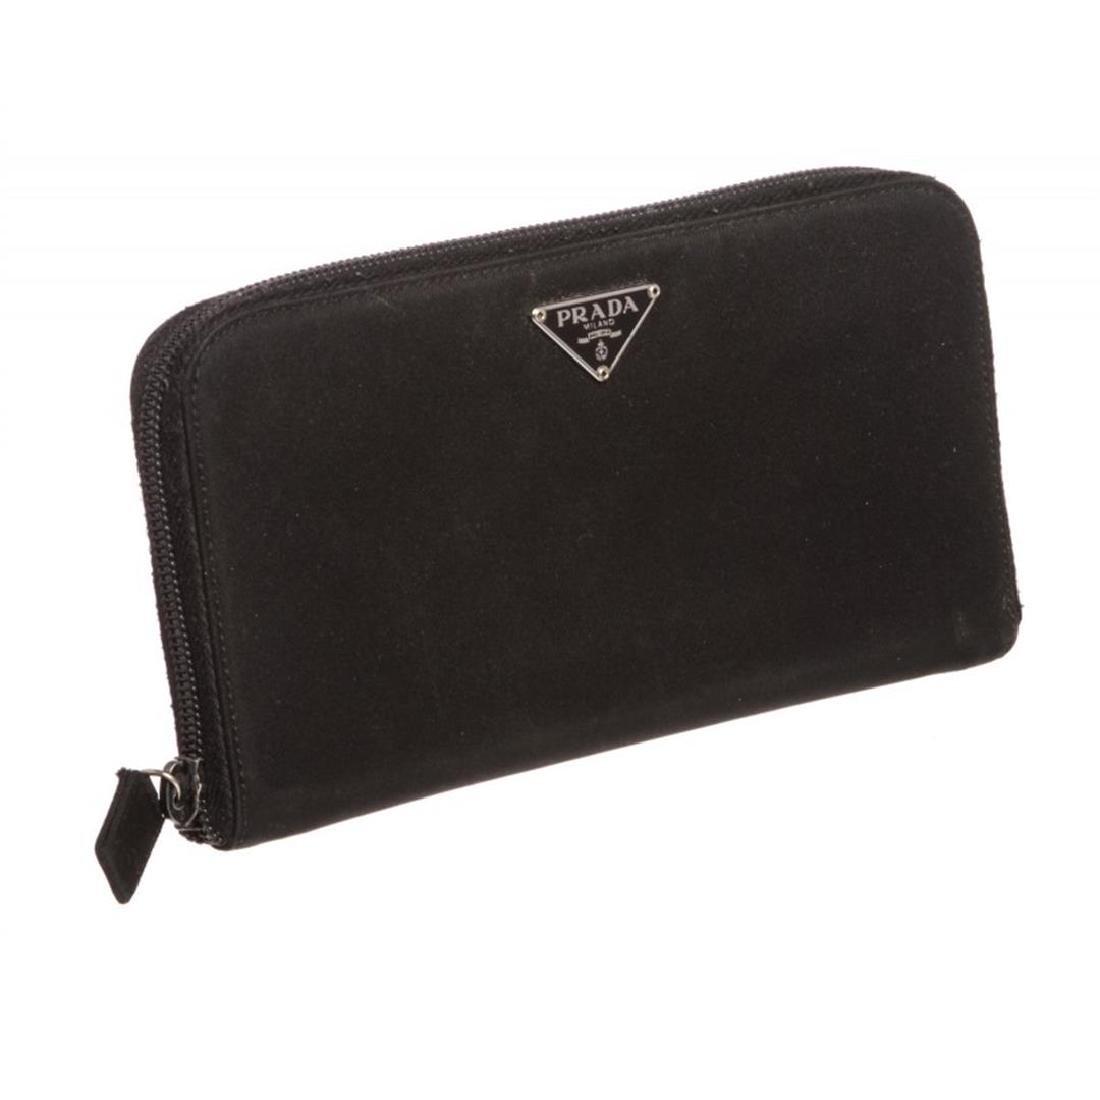 Prada Black Nylon Leather Zipper Wallet - 2